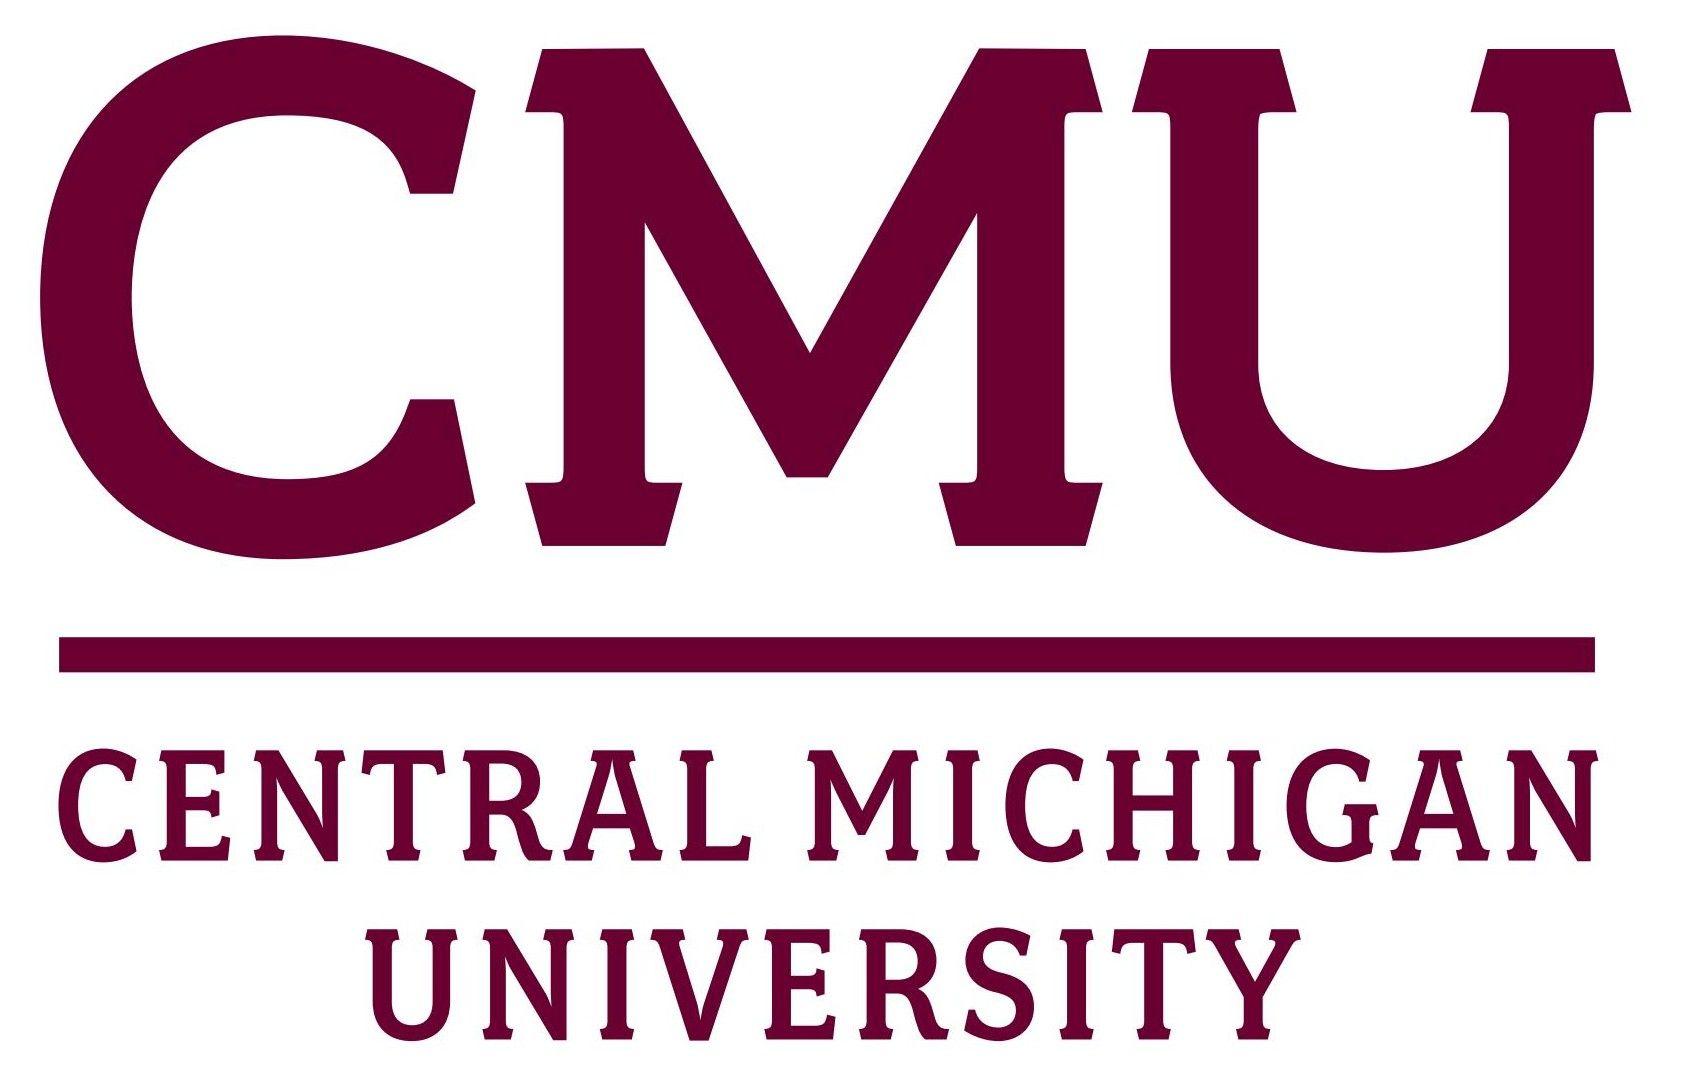 Central Michigan University Cmu Logo Central Michigan University Central Michigan Online University